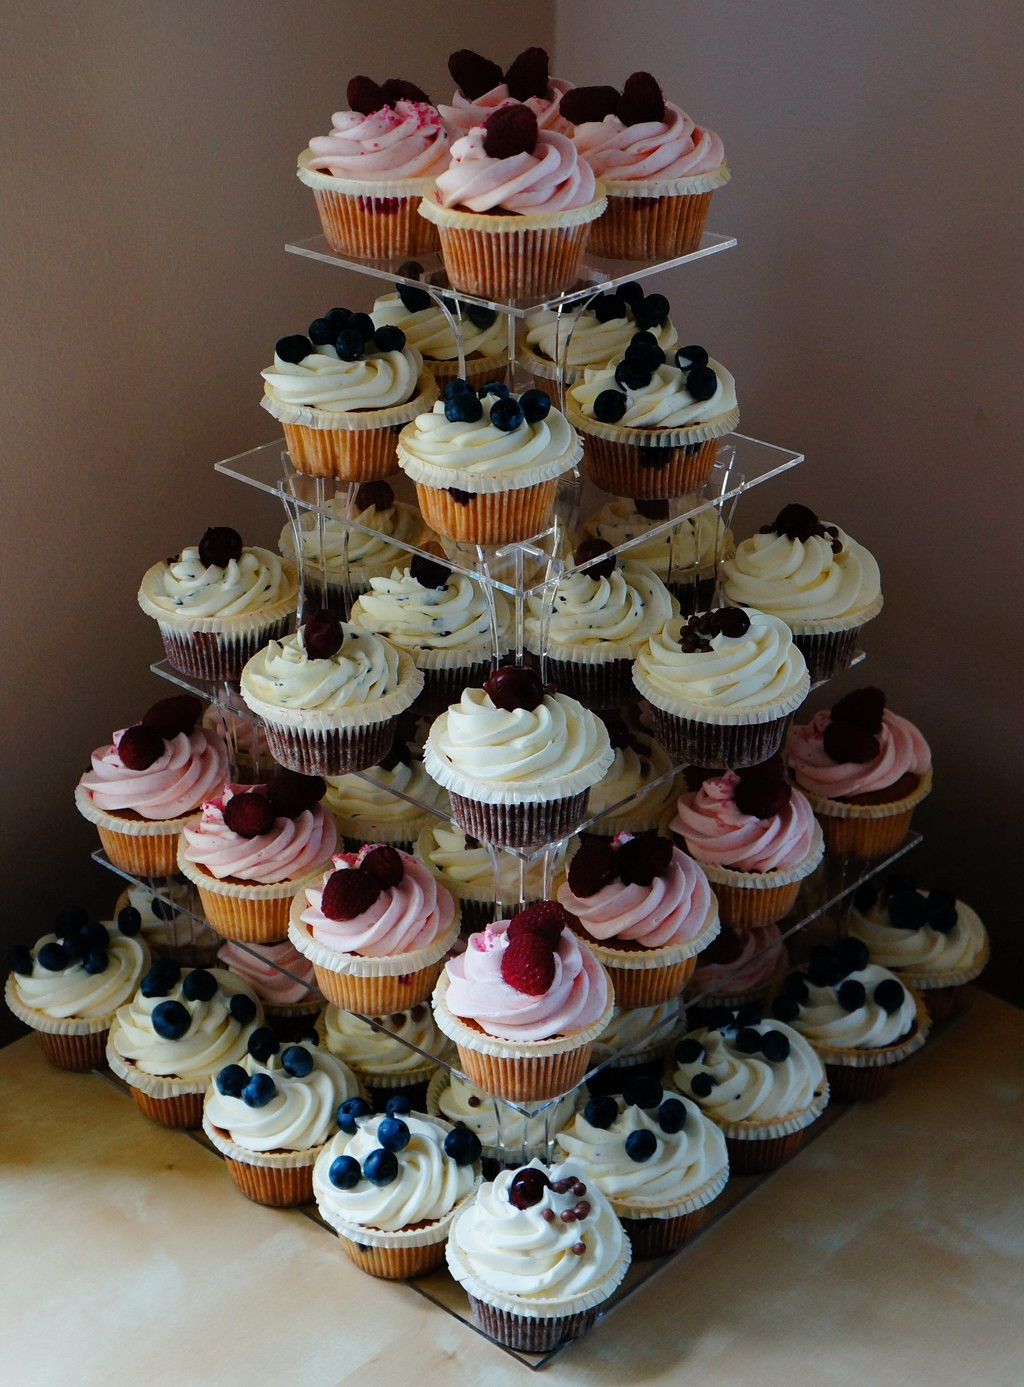 Wedding Cupcake Cakes Designs  Cupcake Designs for Birthday MARGUSRIGA Baby Party